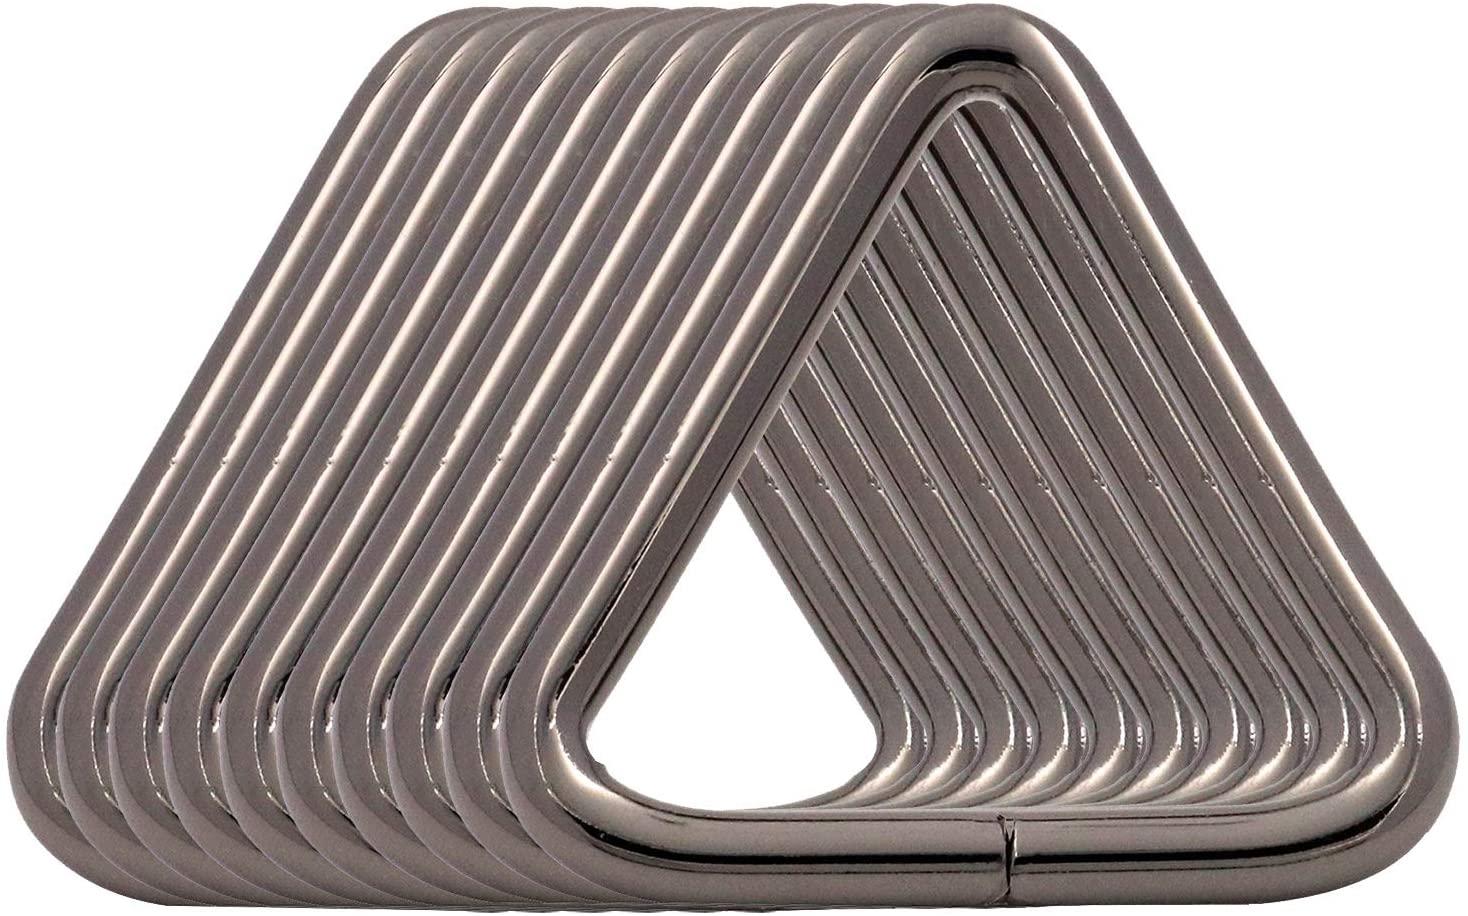 BIKICOCO 1-1/4 Metal Triangle Ring Buckle Connectors Non Welded Round Edge Webbing Bag Clasp Handbag Strap Making Hardware, Gunmetal - Pack of 10